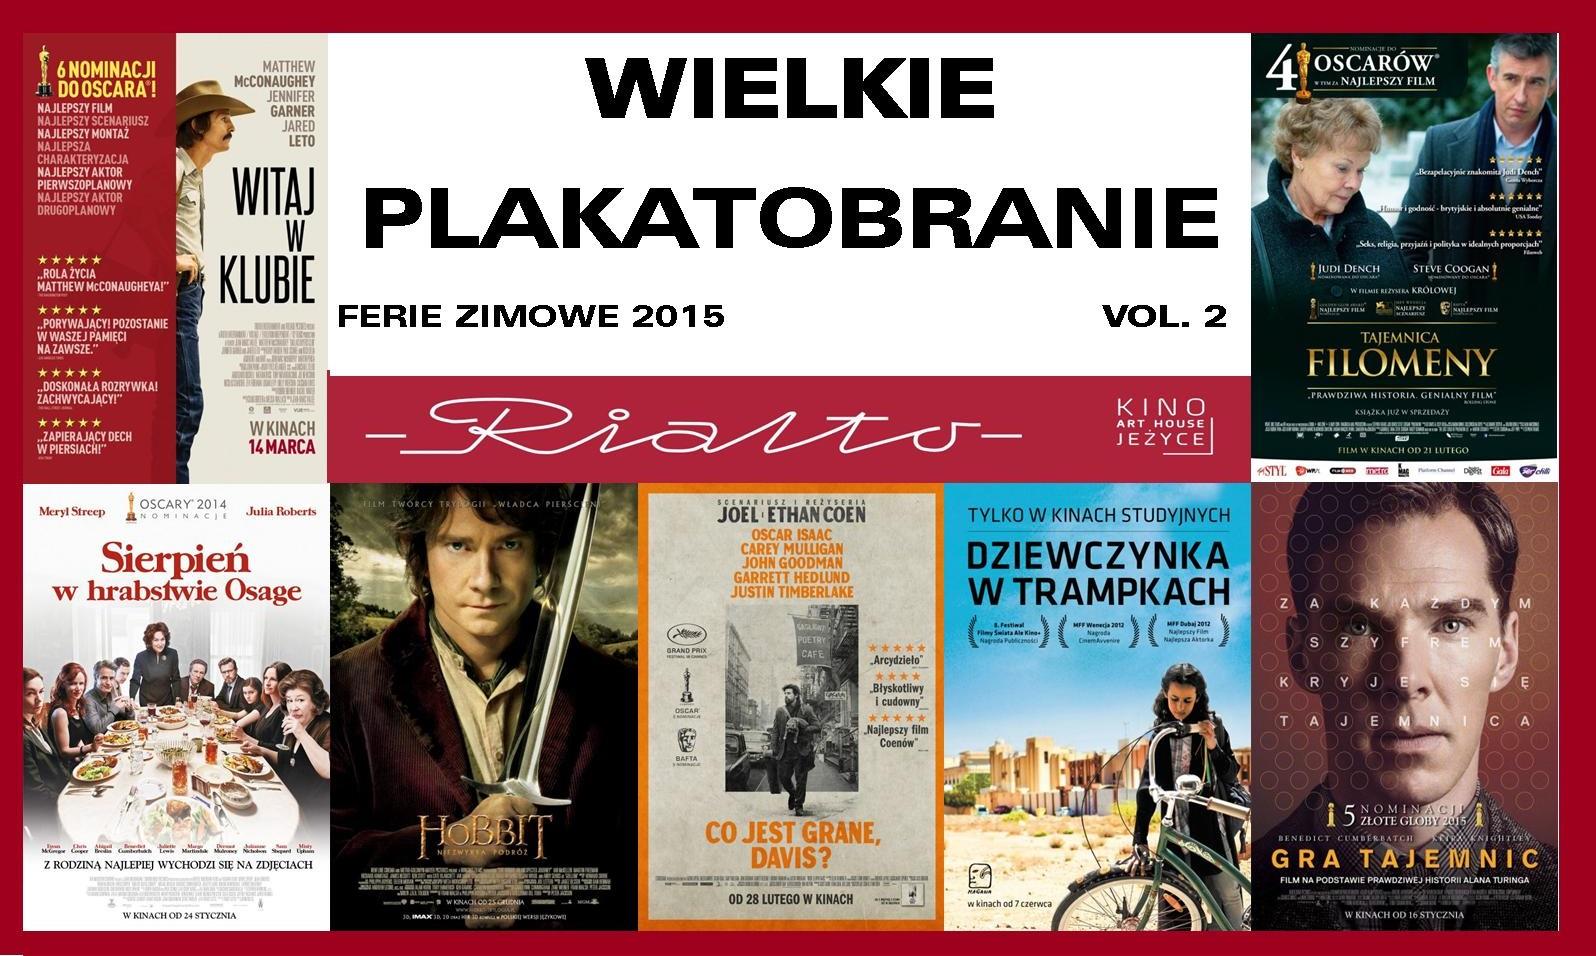 WIELKIE-PLAKATOBRANIE-VOL-2-PLAKAT